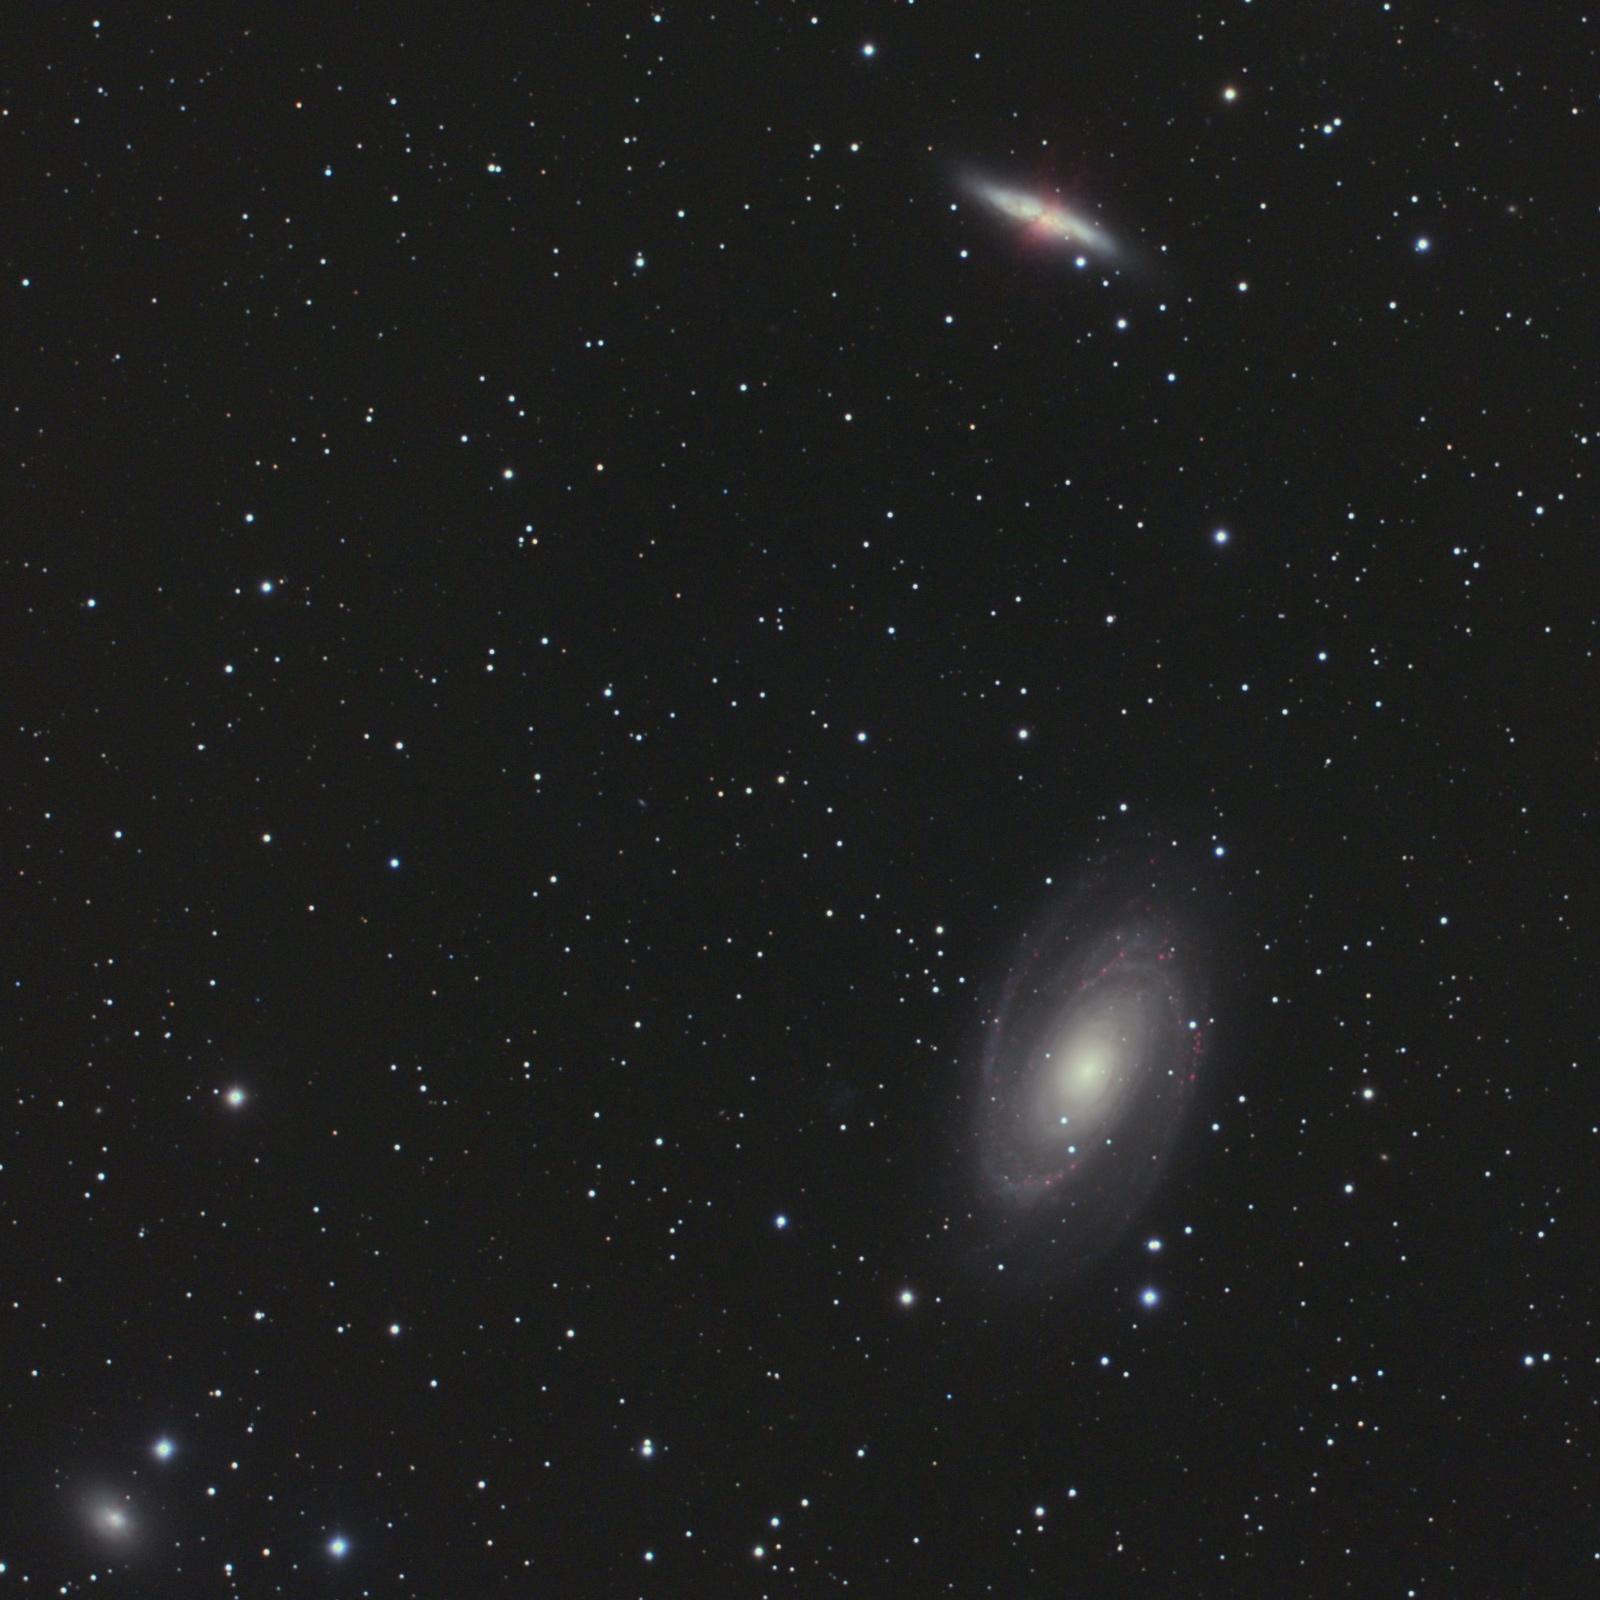 M81m82_fc60f6_tr